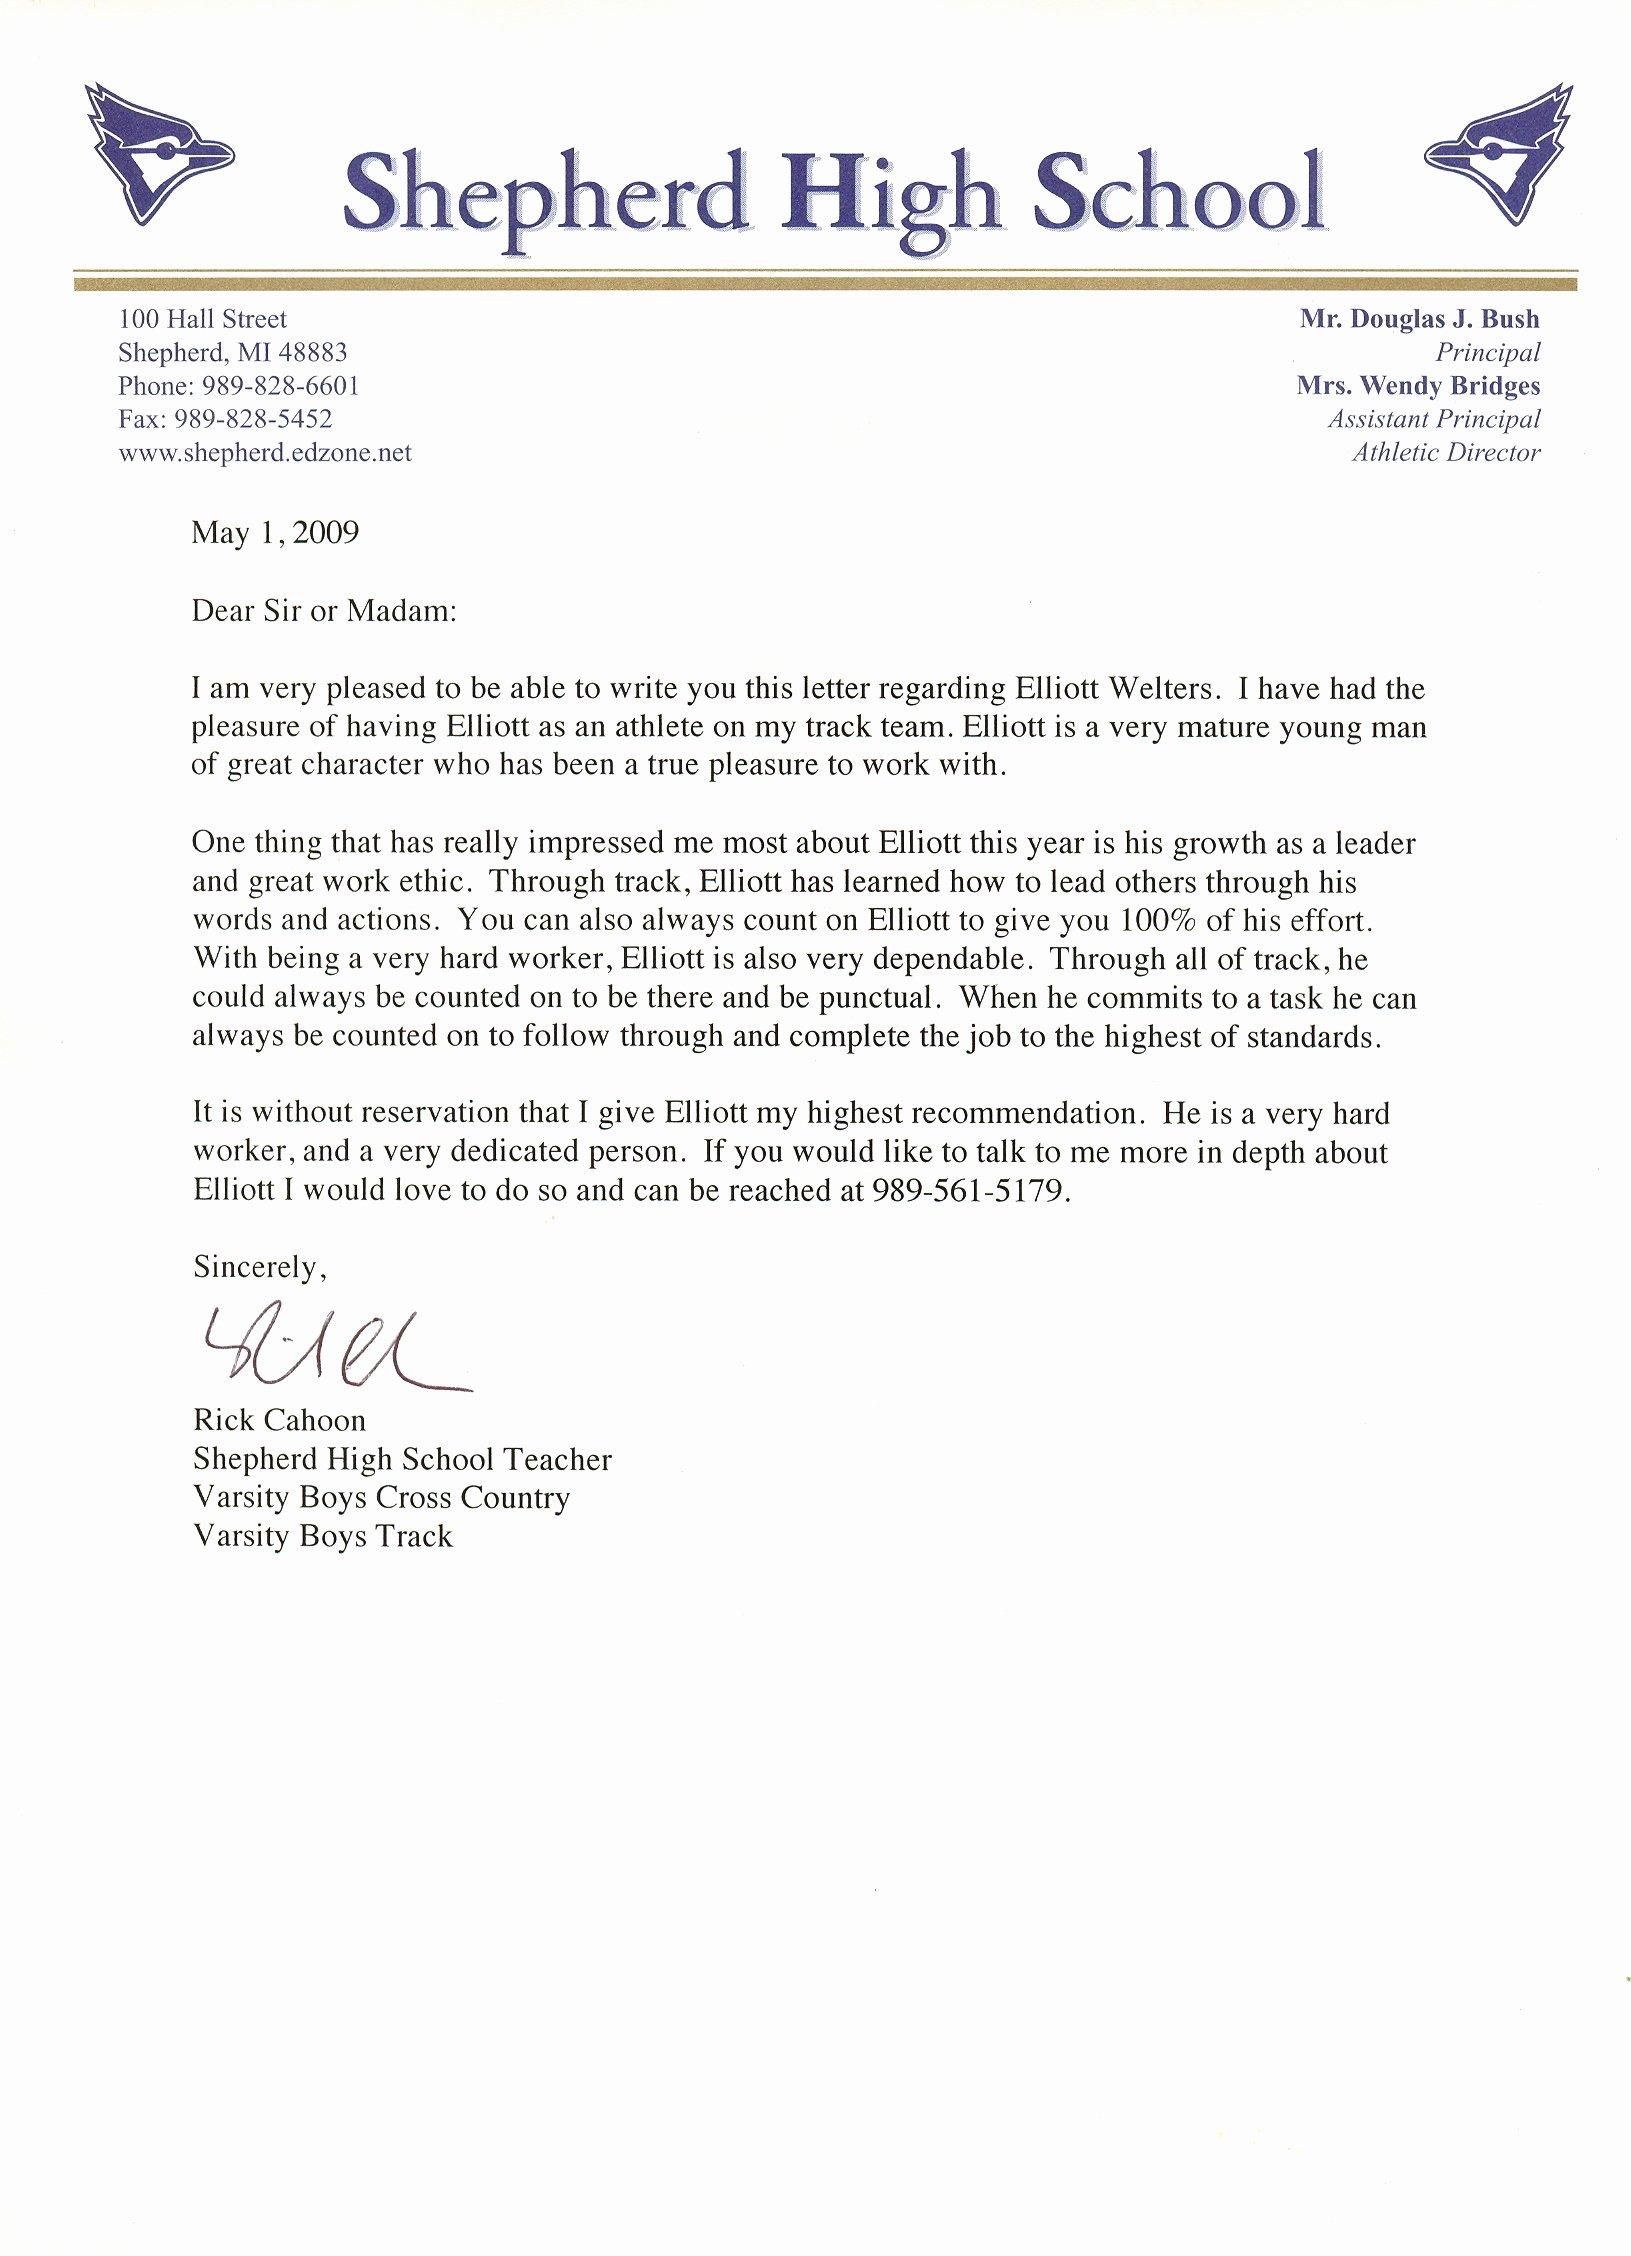 Letter Of Recommendation for athlete Unique Writing A Letter Re Mendation for A Student athlete